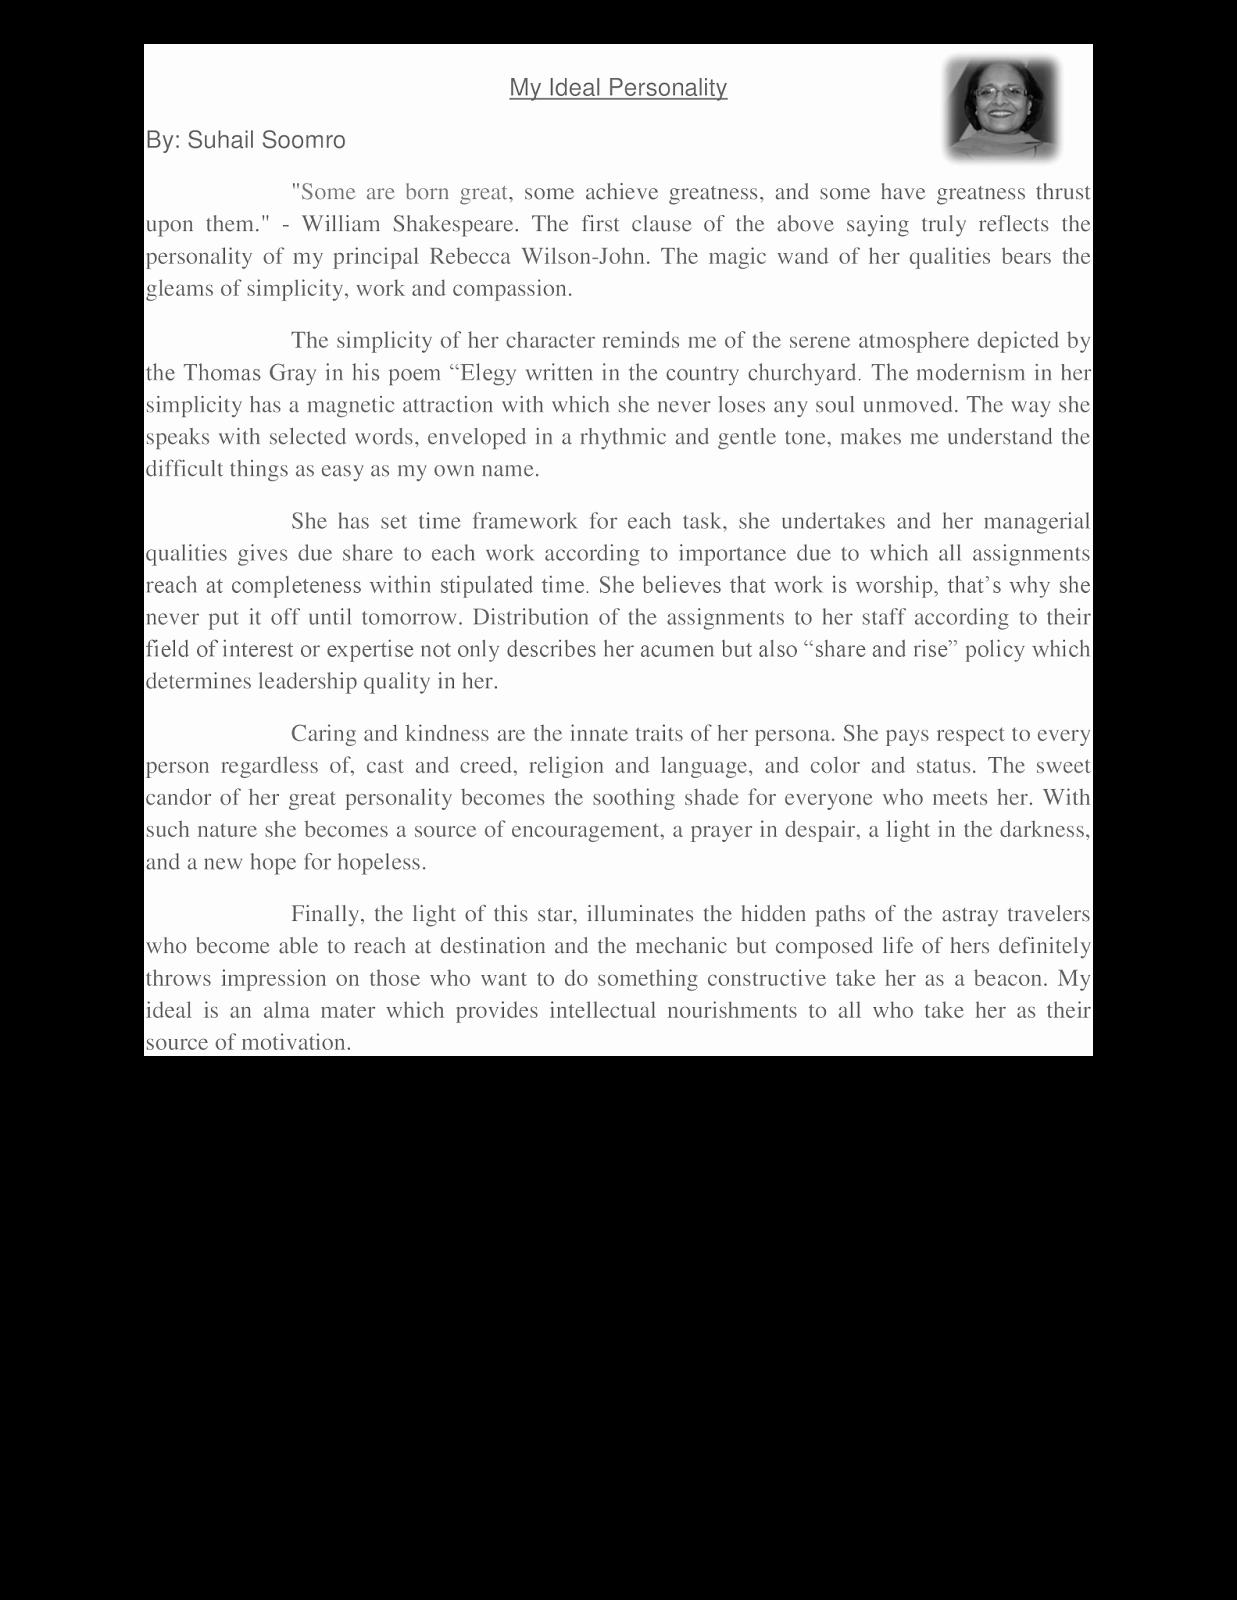 Personality Profile Essay Examples Beautiful Contoh Essay Bahasa Inggris 3 Paragraf Fontoh